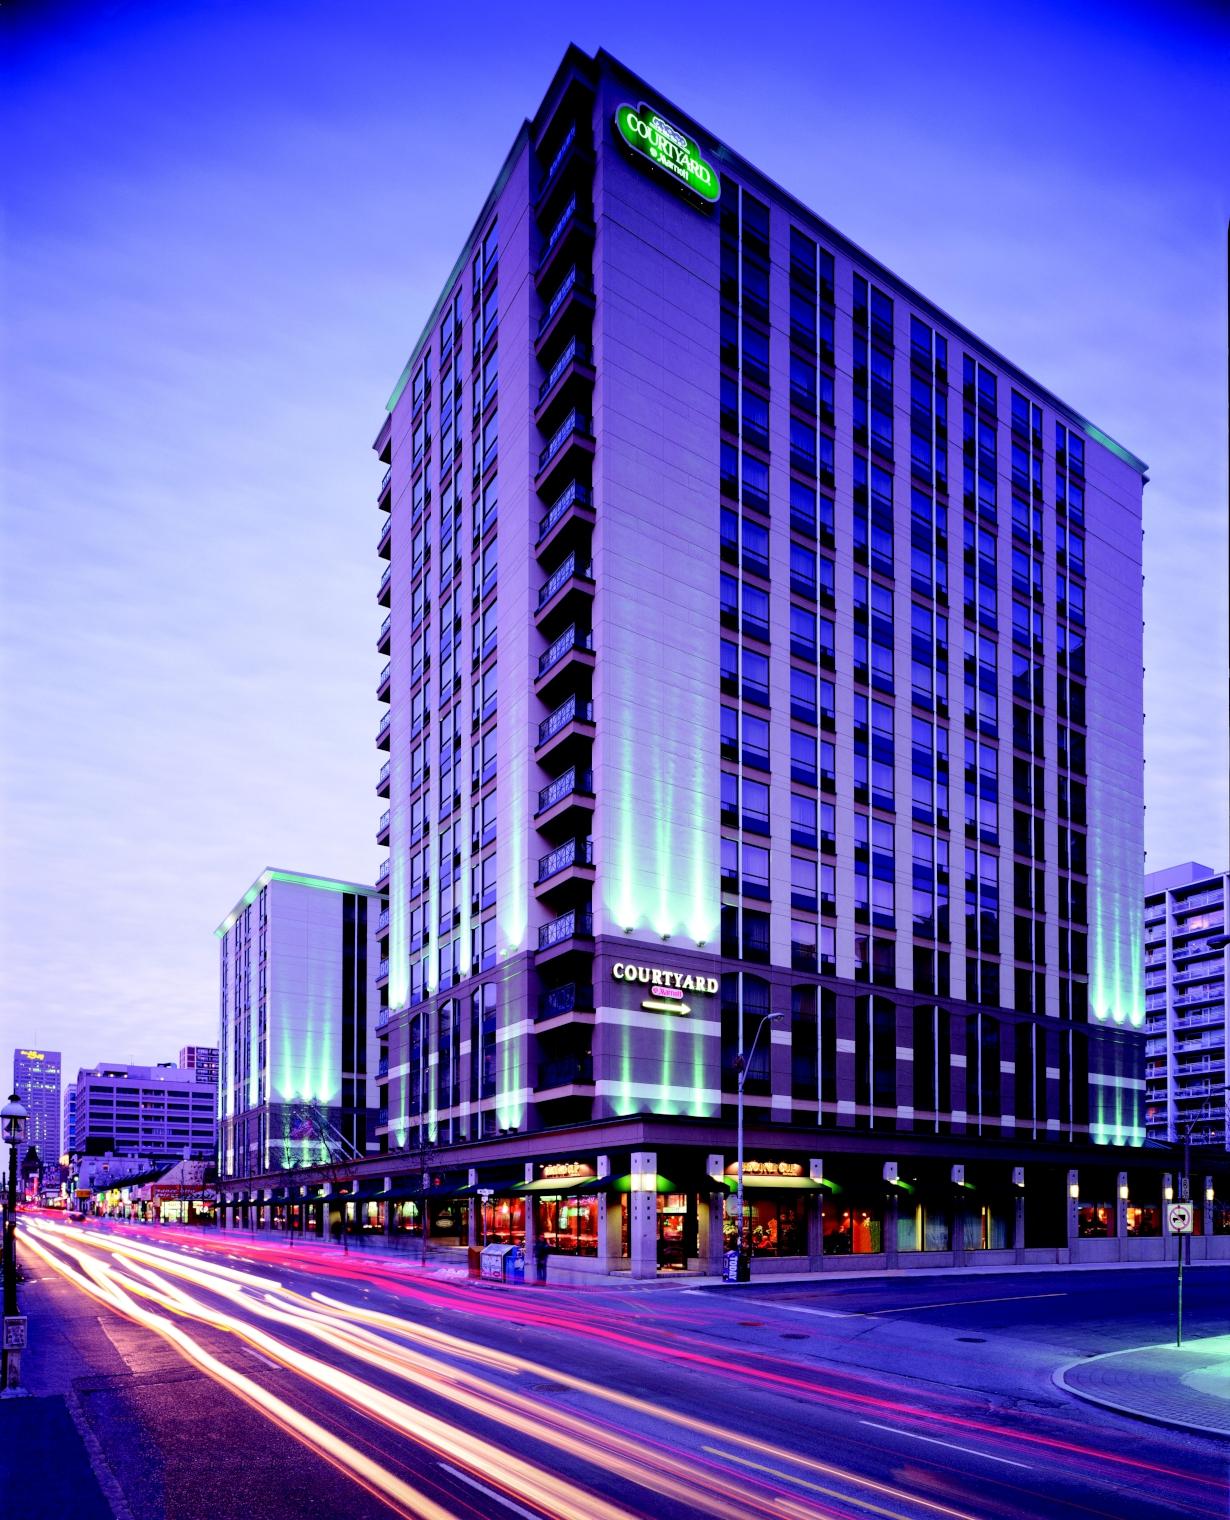 Courtyard Marriott Hotel Yonge Street Toronto